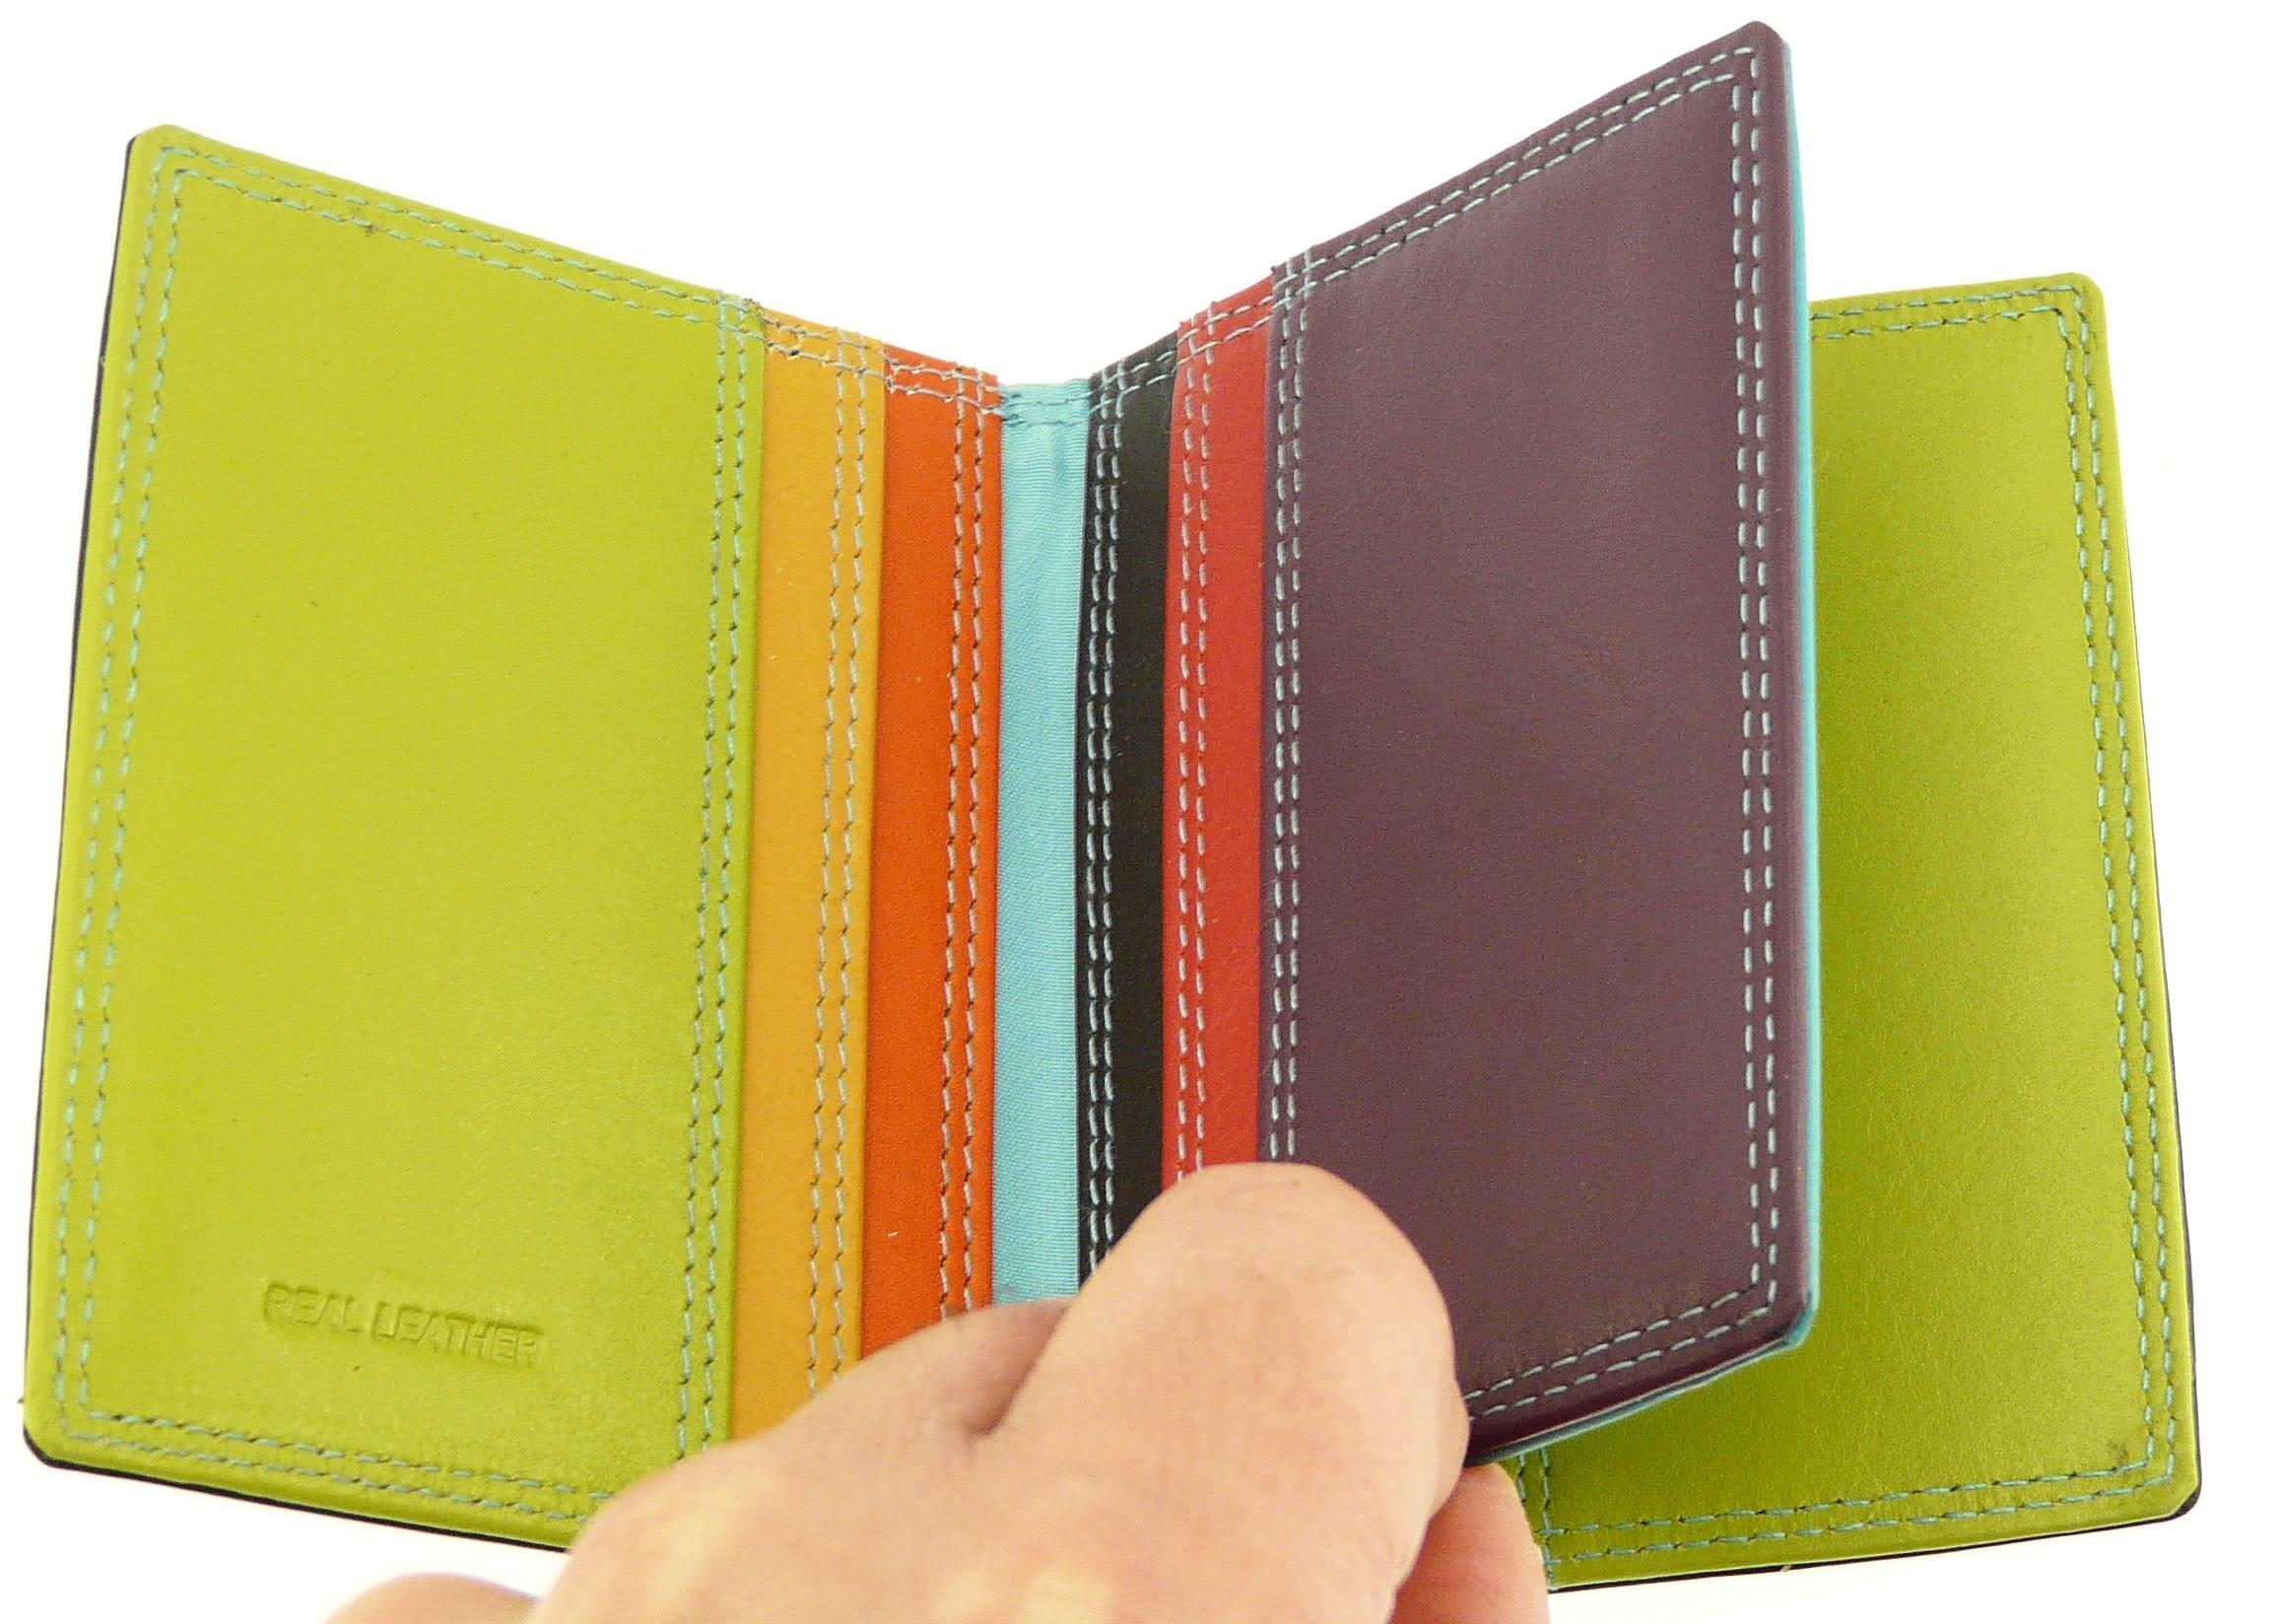 Black & Multi-color Leather Credit Card Holder / Wallet - Holds 10 Credit Cards by Neptune Giftware (Image #5)